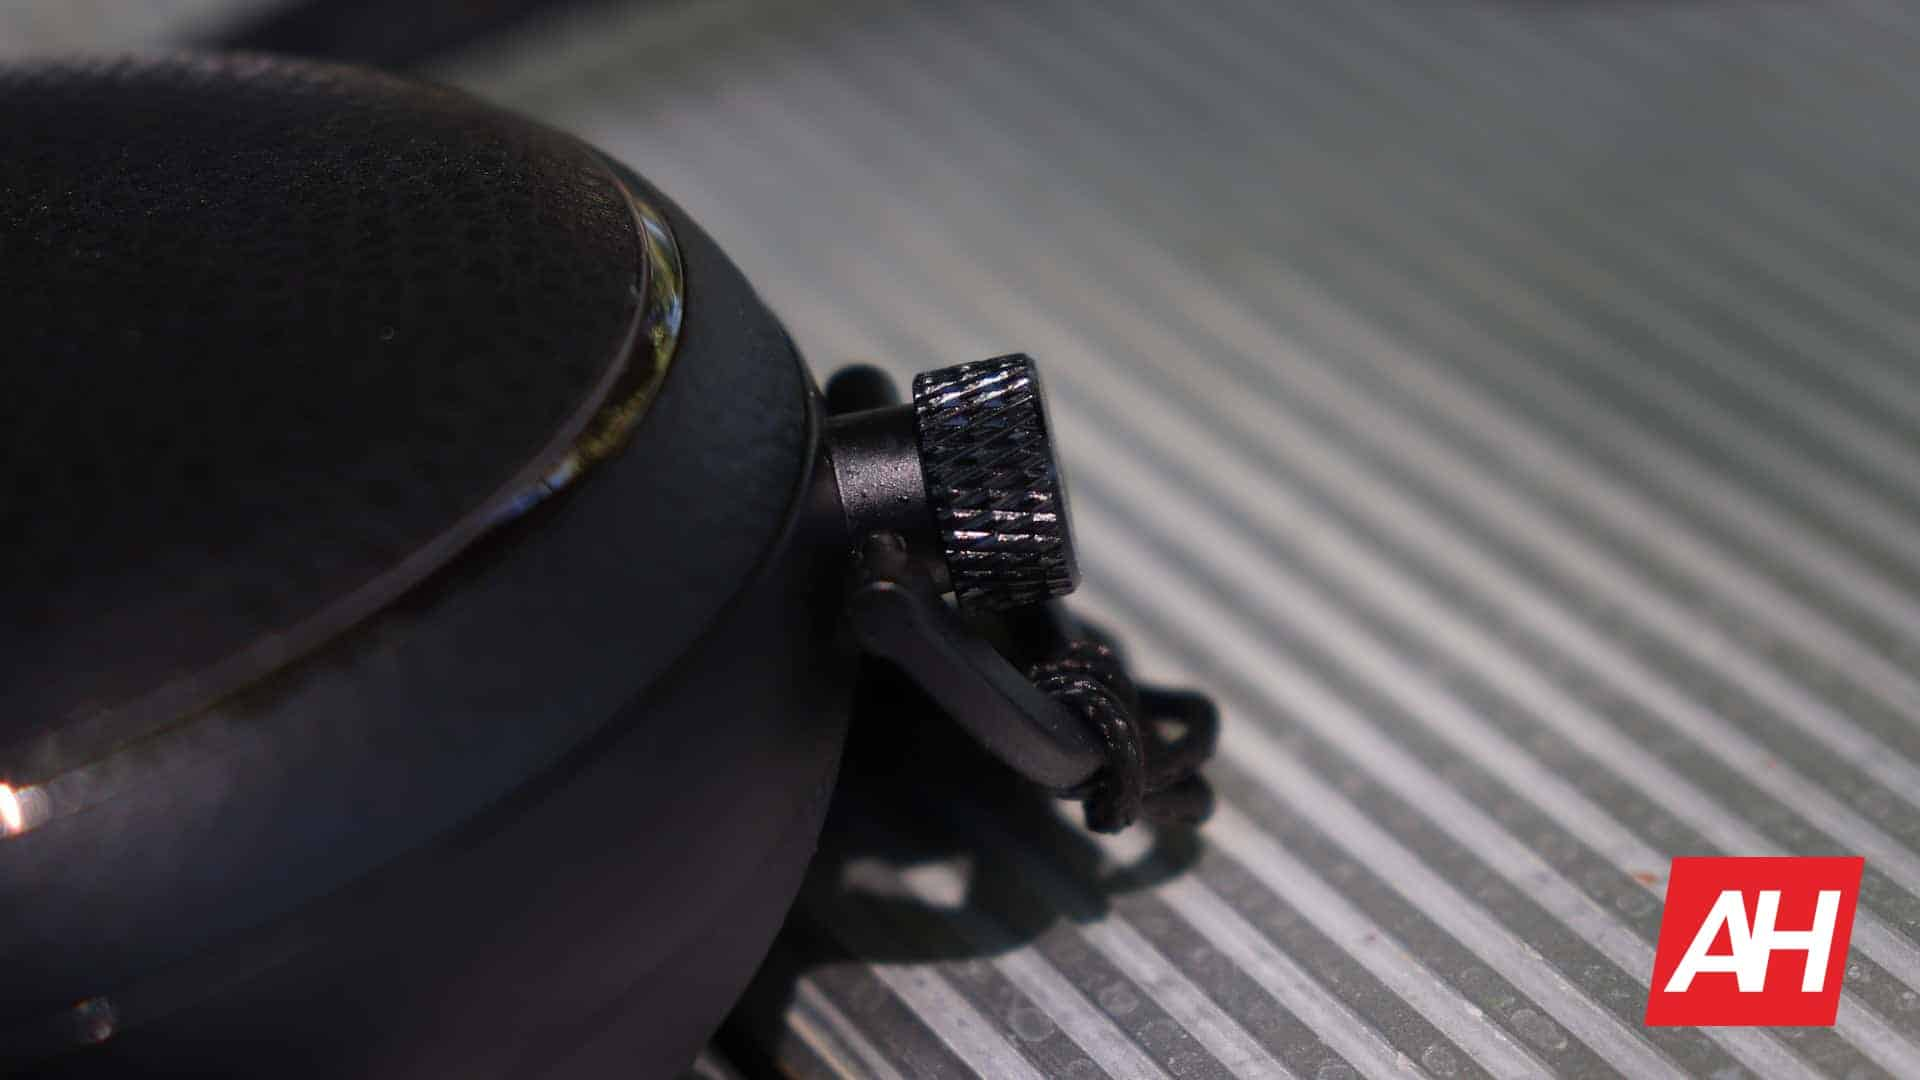 01 1 PaMu Quiet Review Hardware DG AH 2020